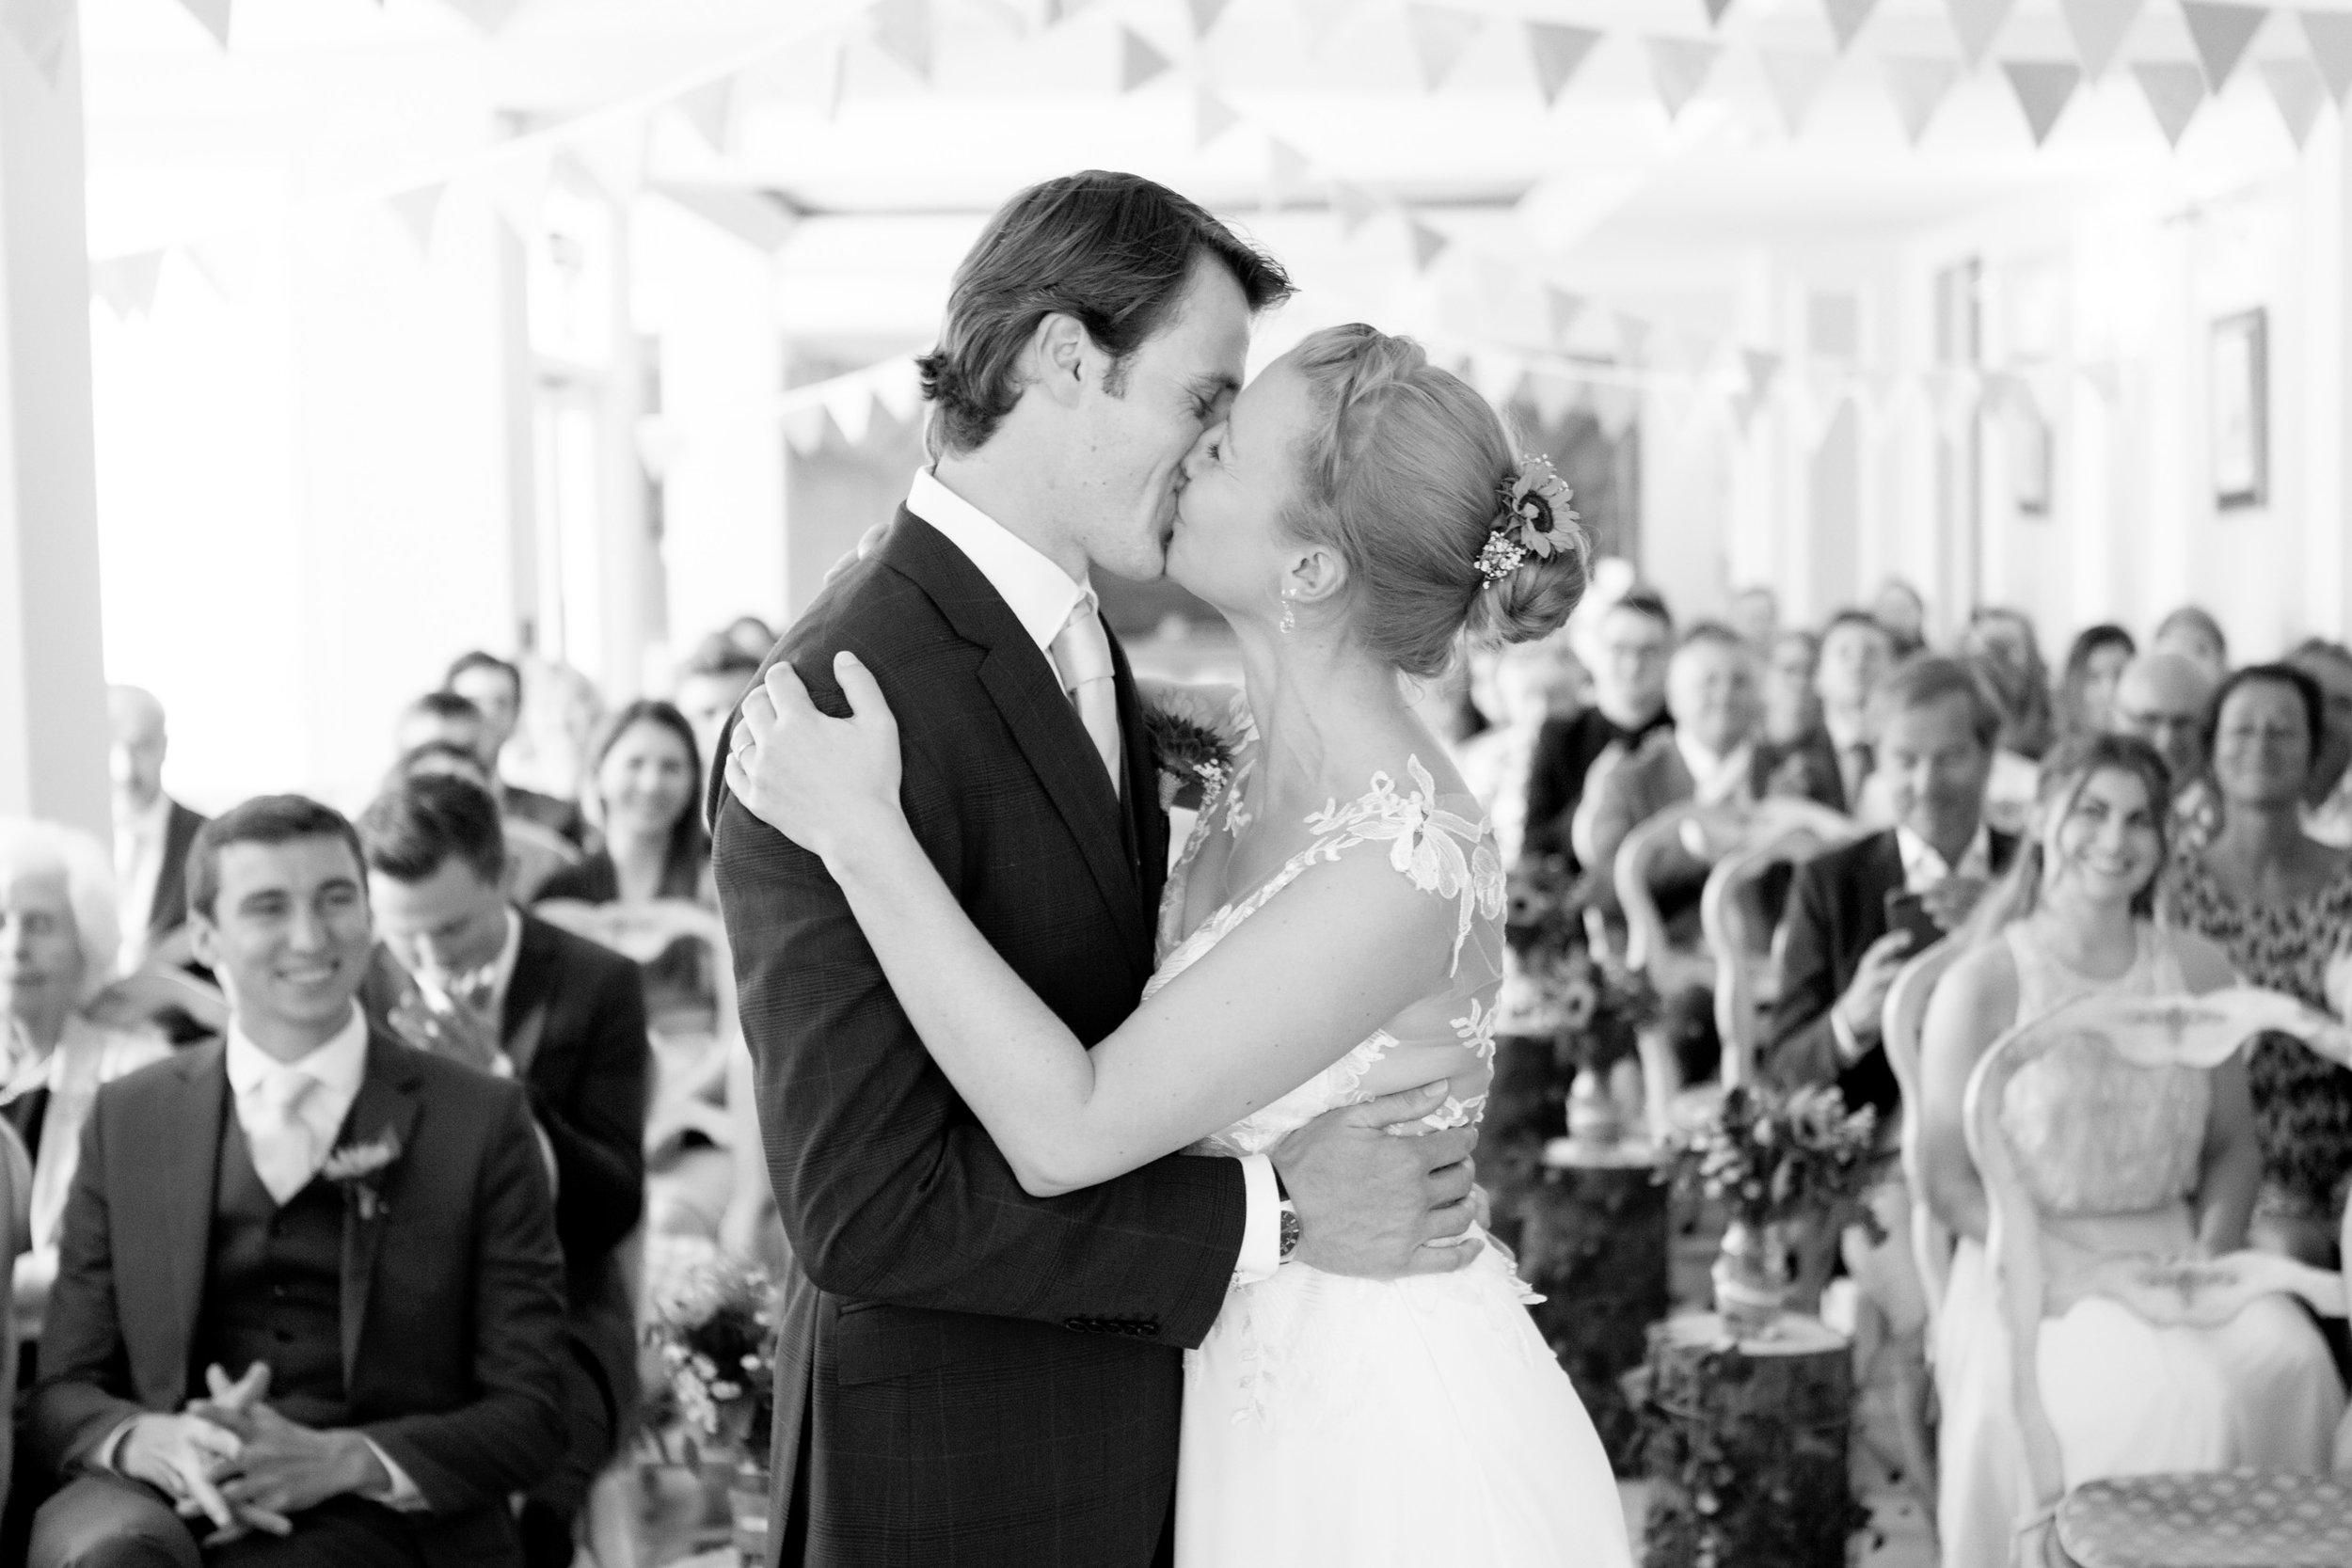 Bucklands-Tout-Saints-Hotel-Devon-Wedding-Photography-12.jpg